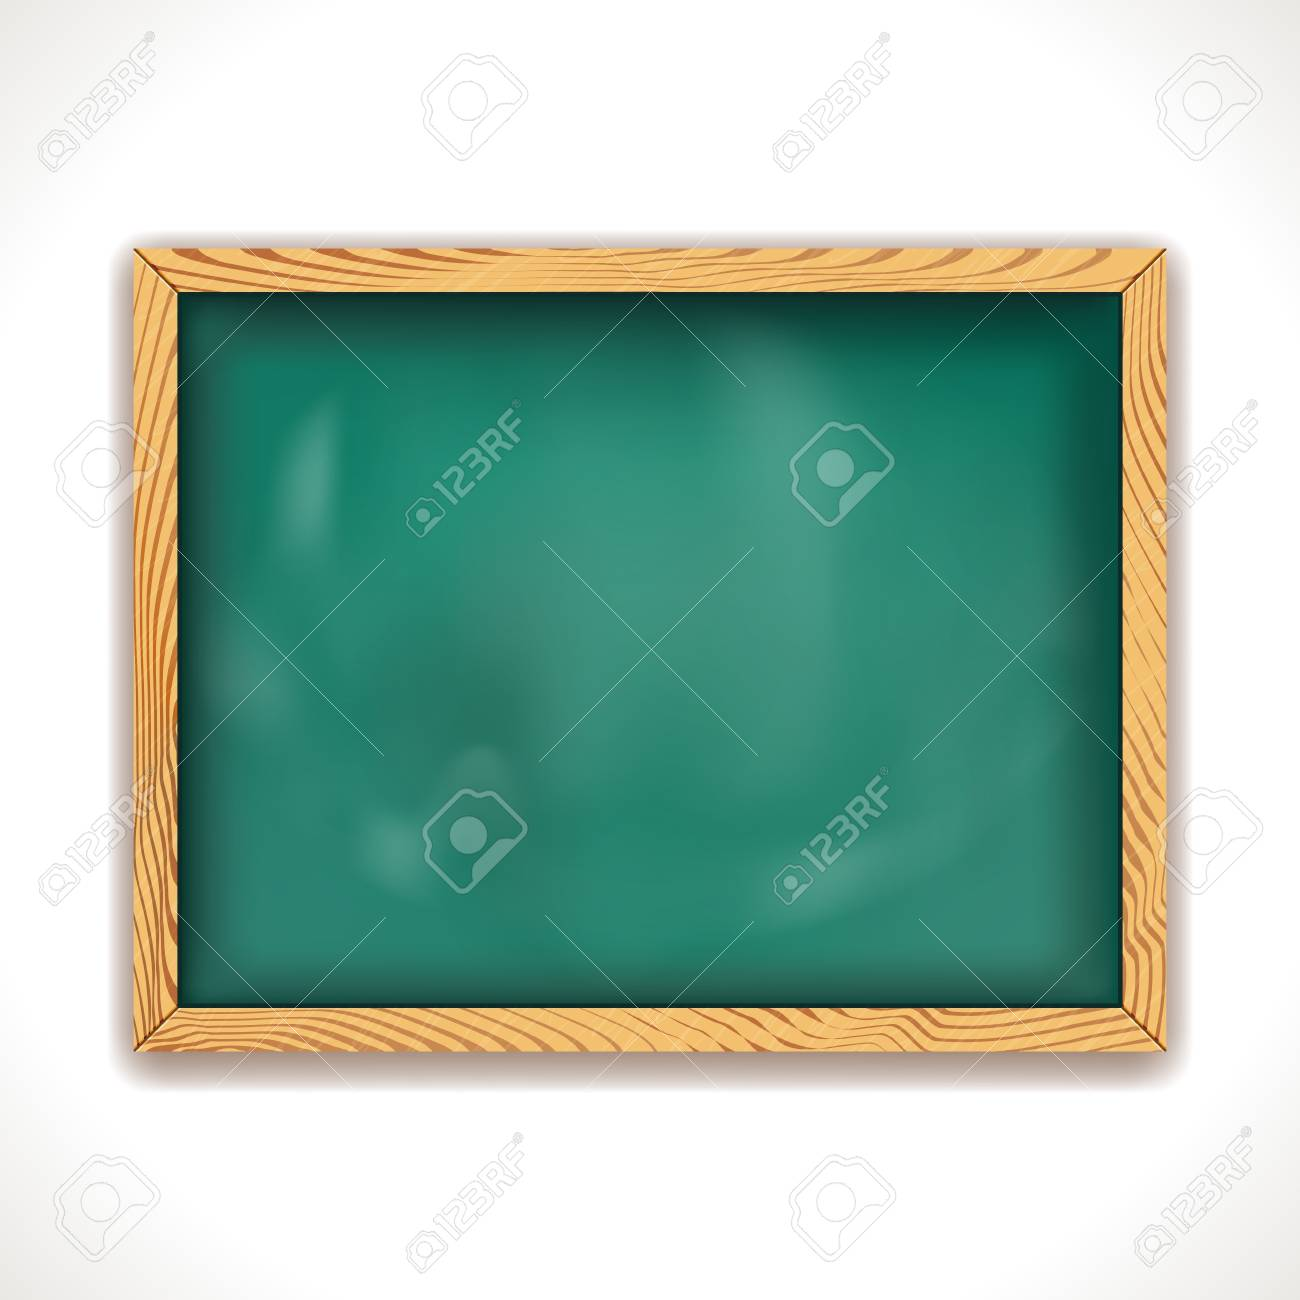 Green Blackboard isolated on white  Illustration Stock Vector - 16112749